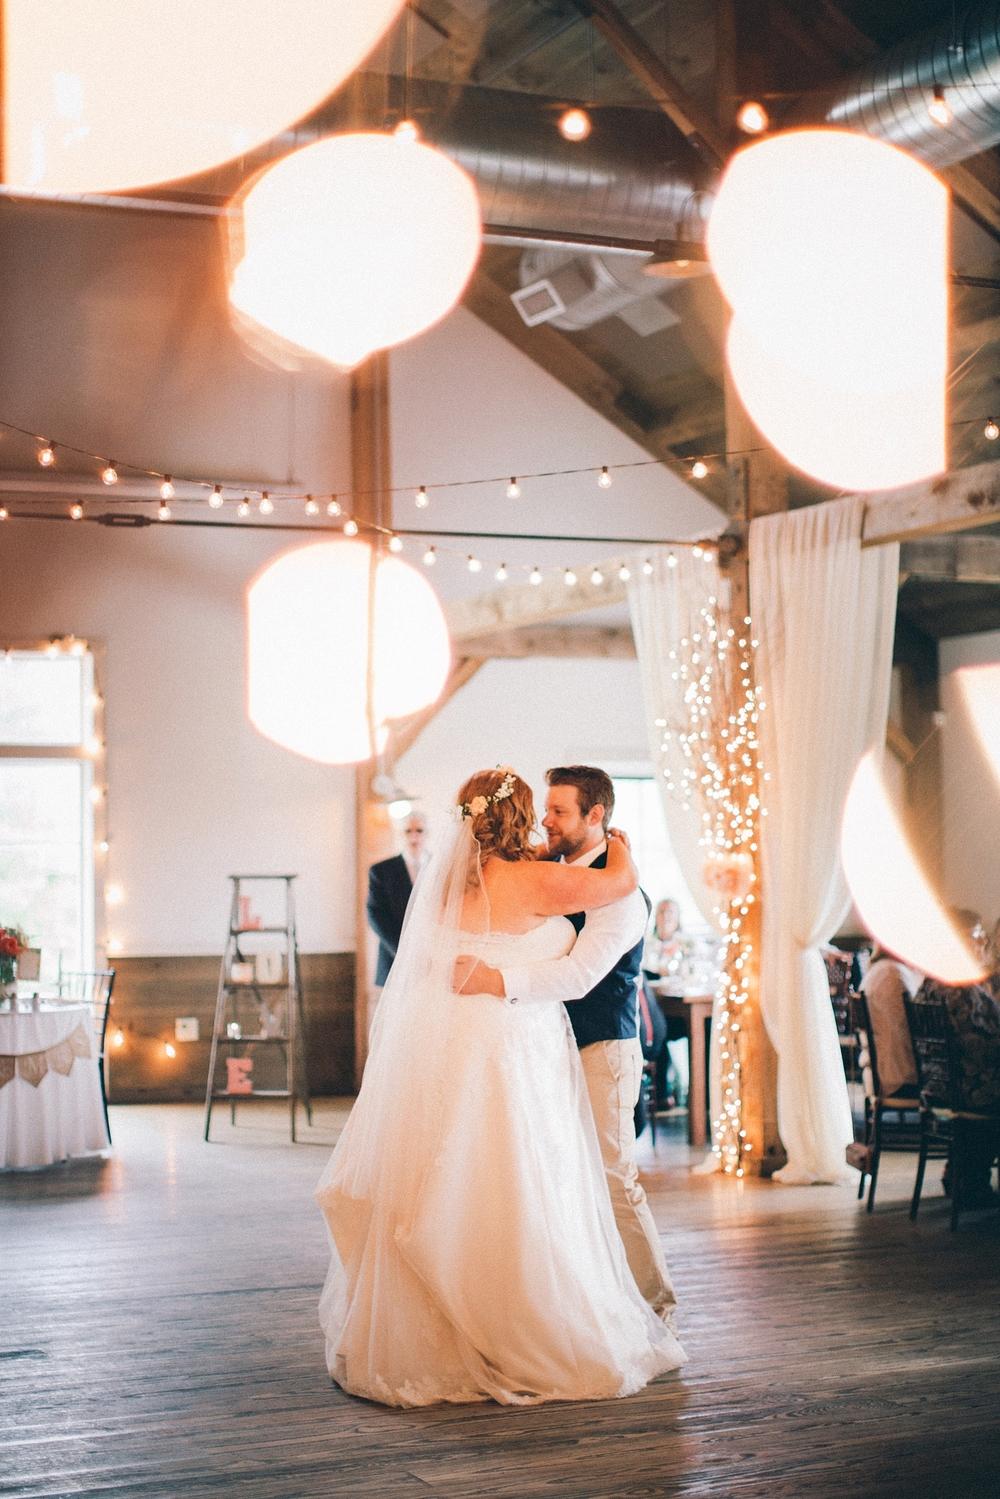 vermont-outdoor-wedding-ceremony-photographer_0046.jpg